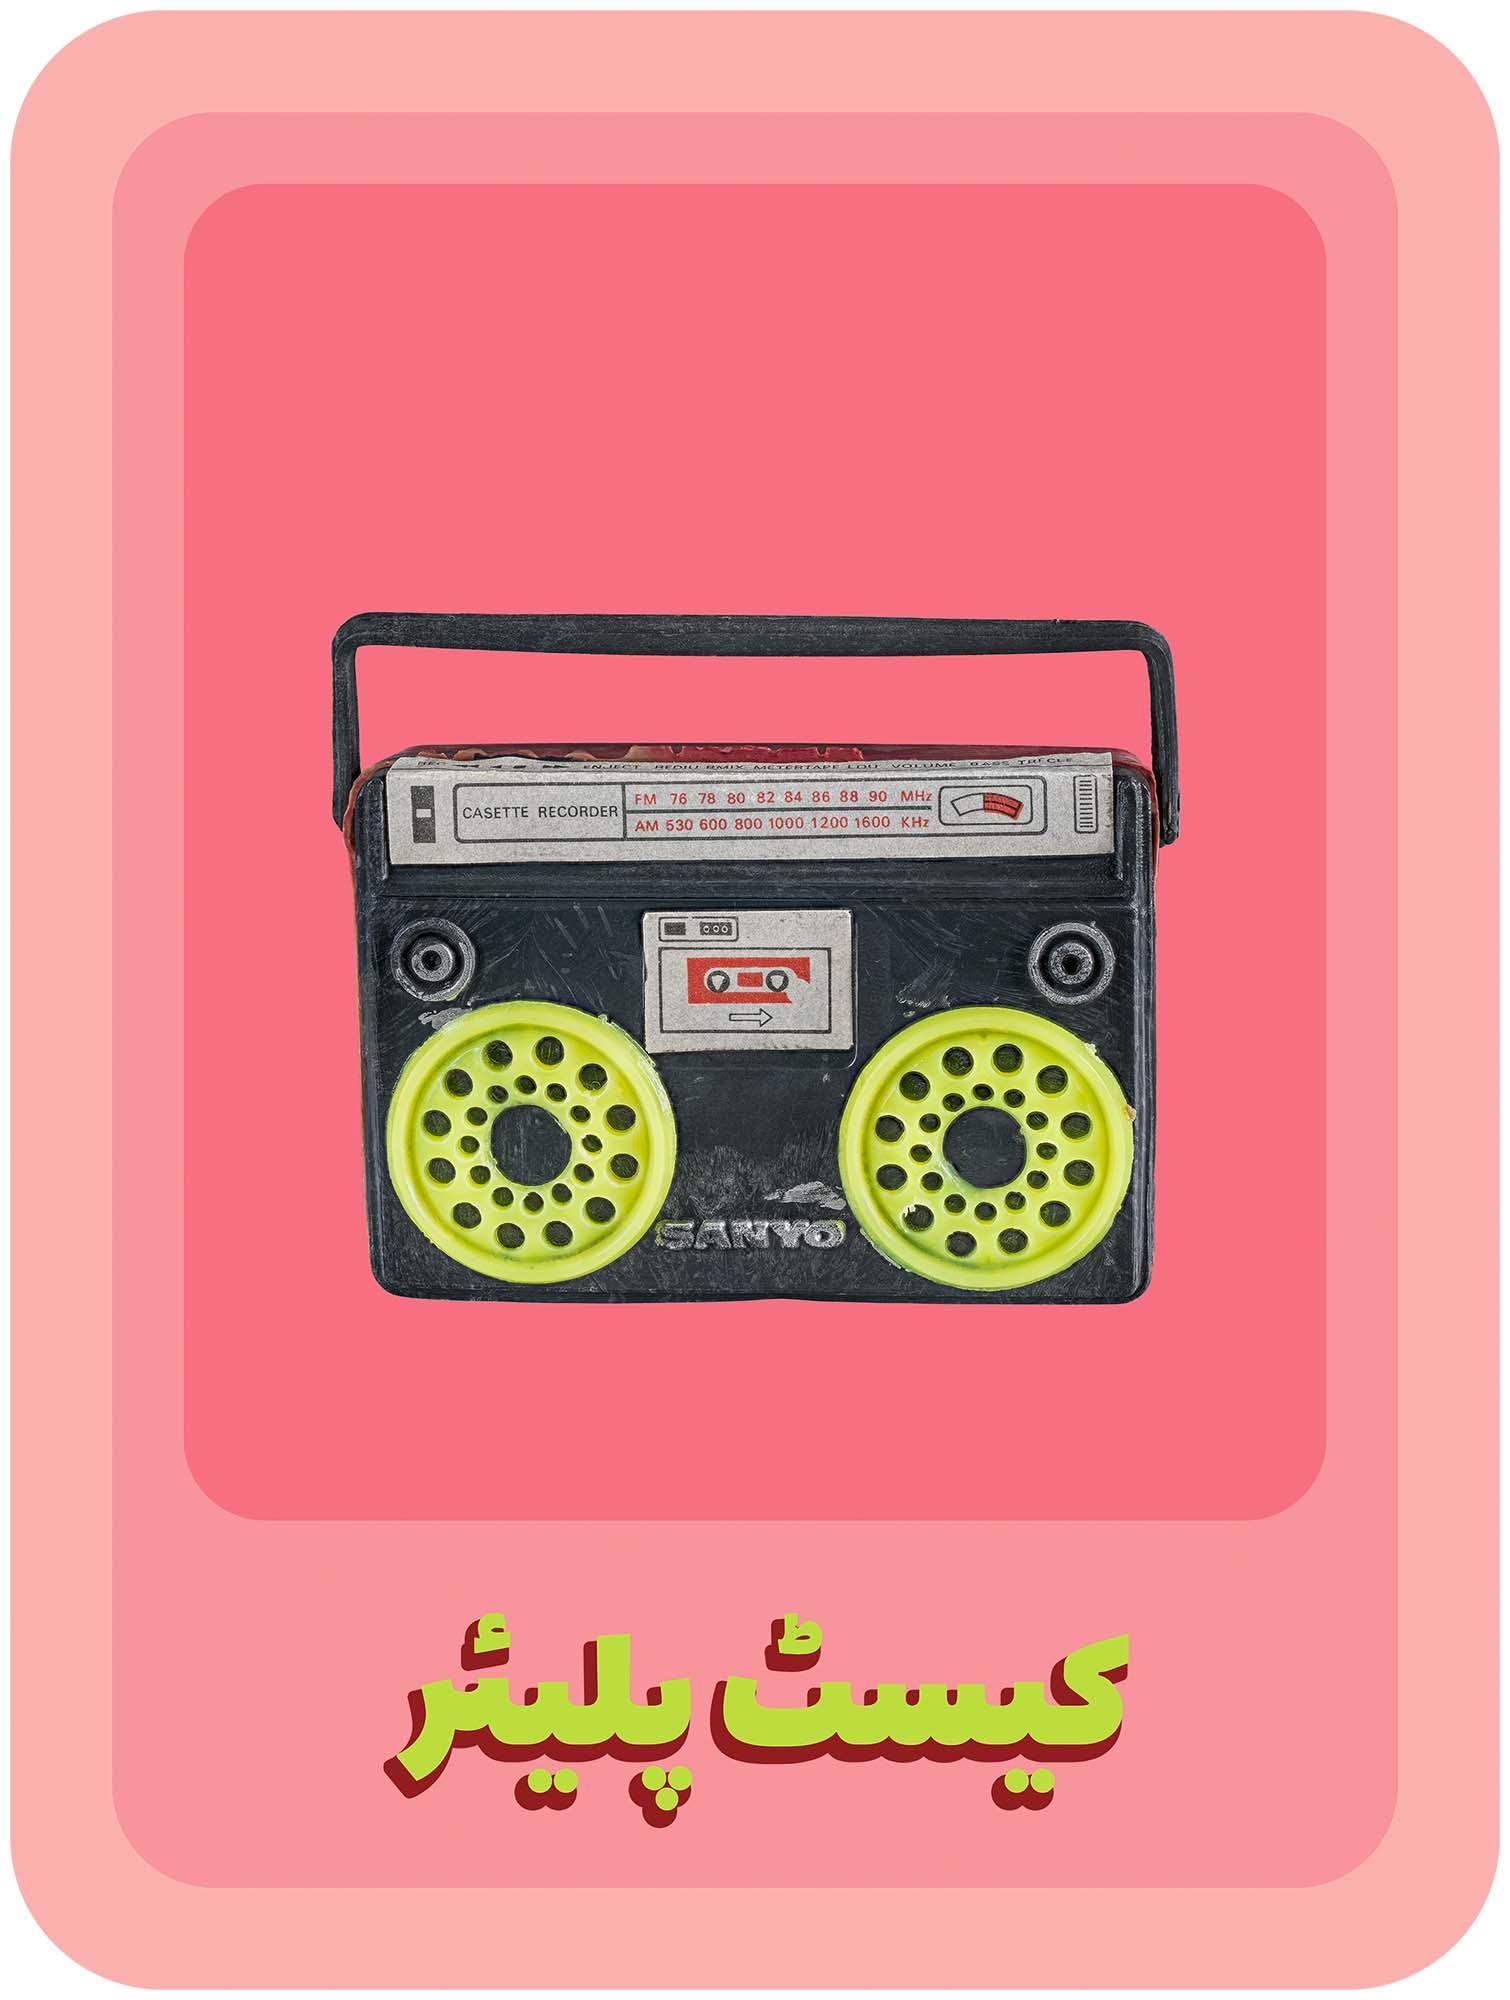 Cassette Player #2